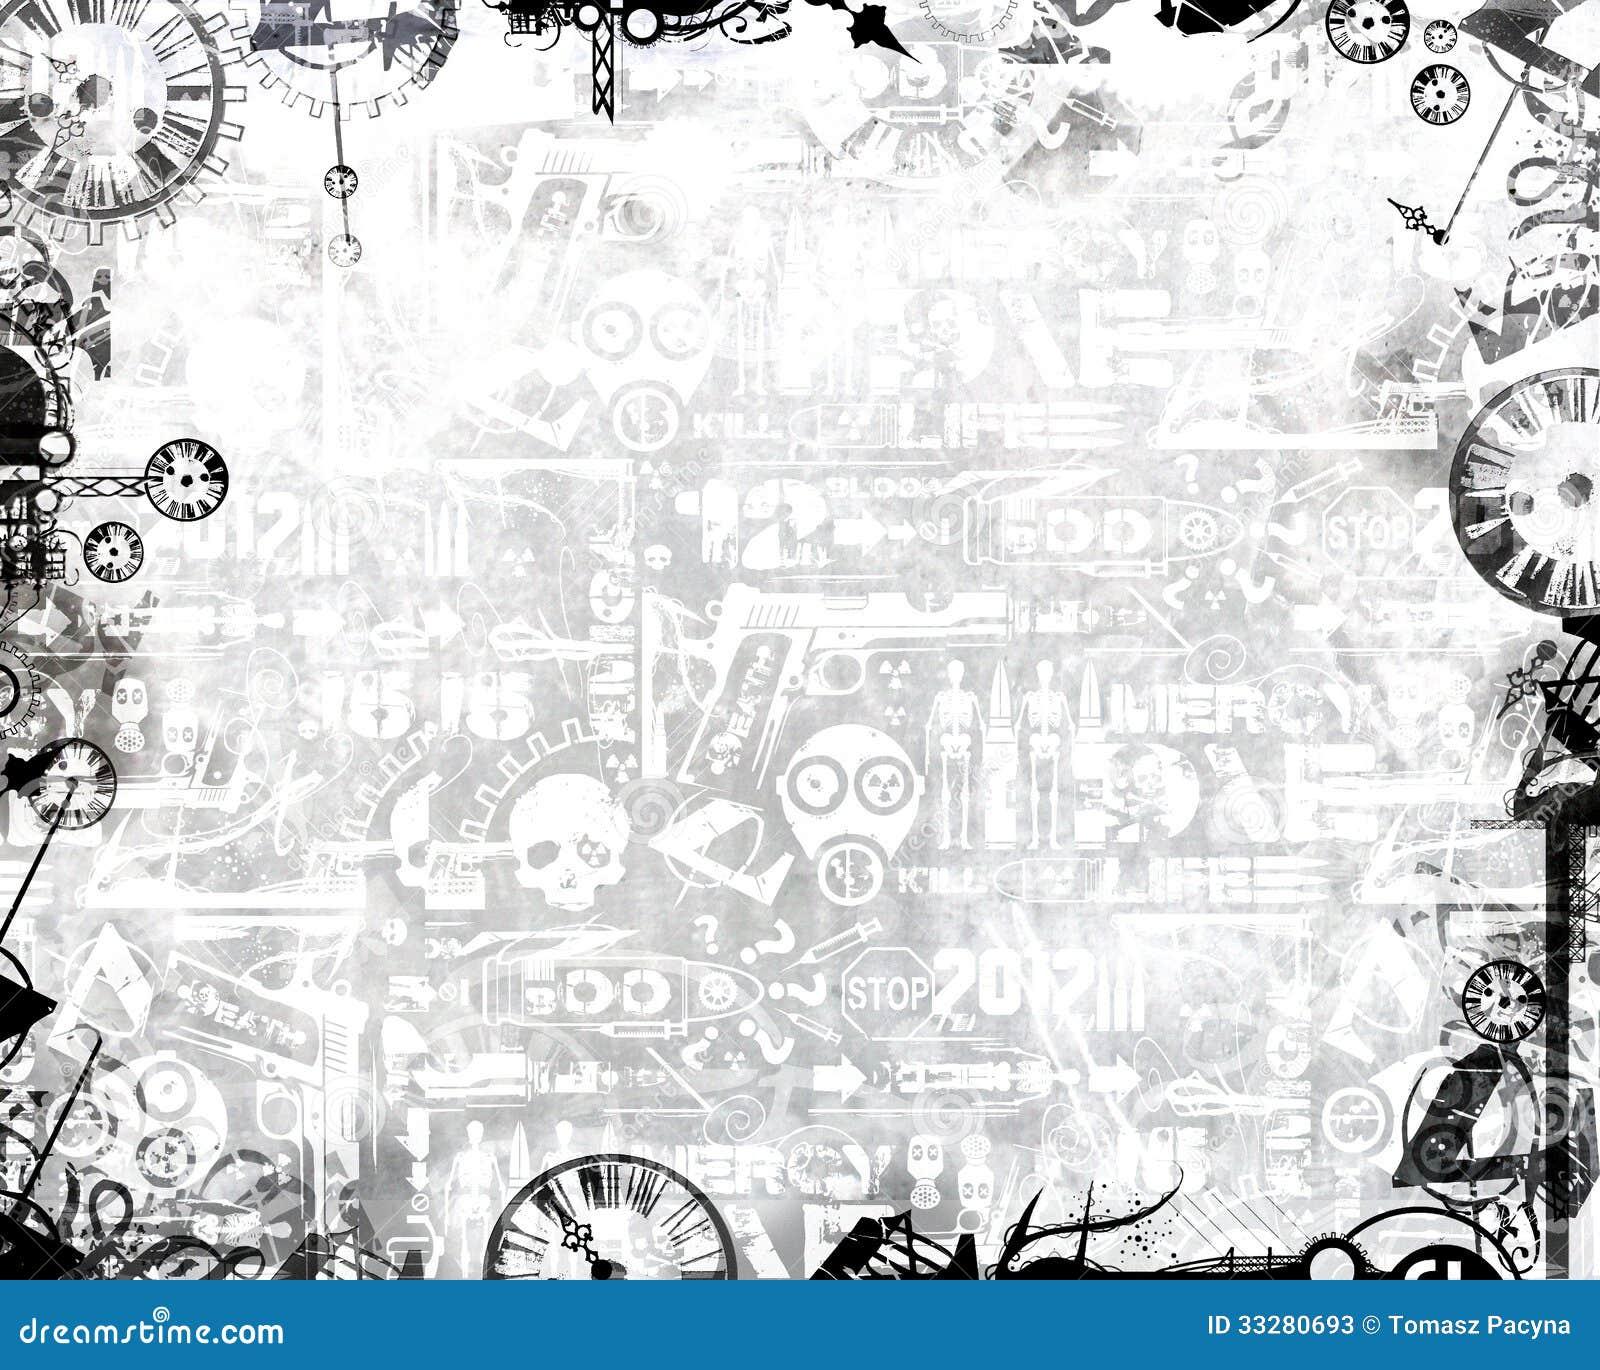 Creative monochrome clocks industrial frame white background